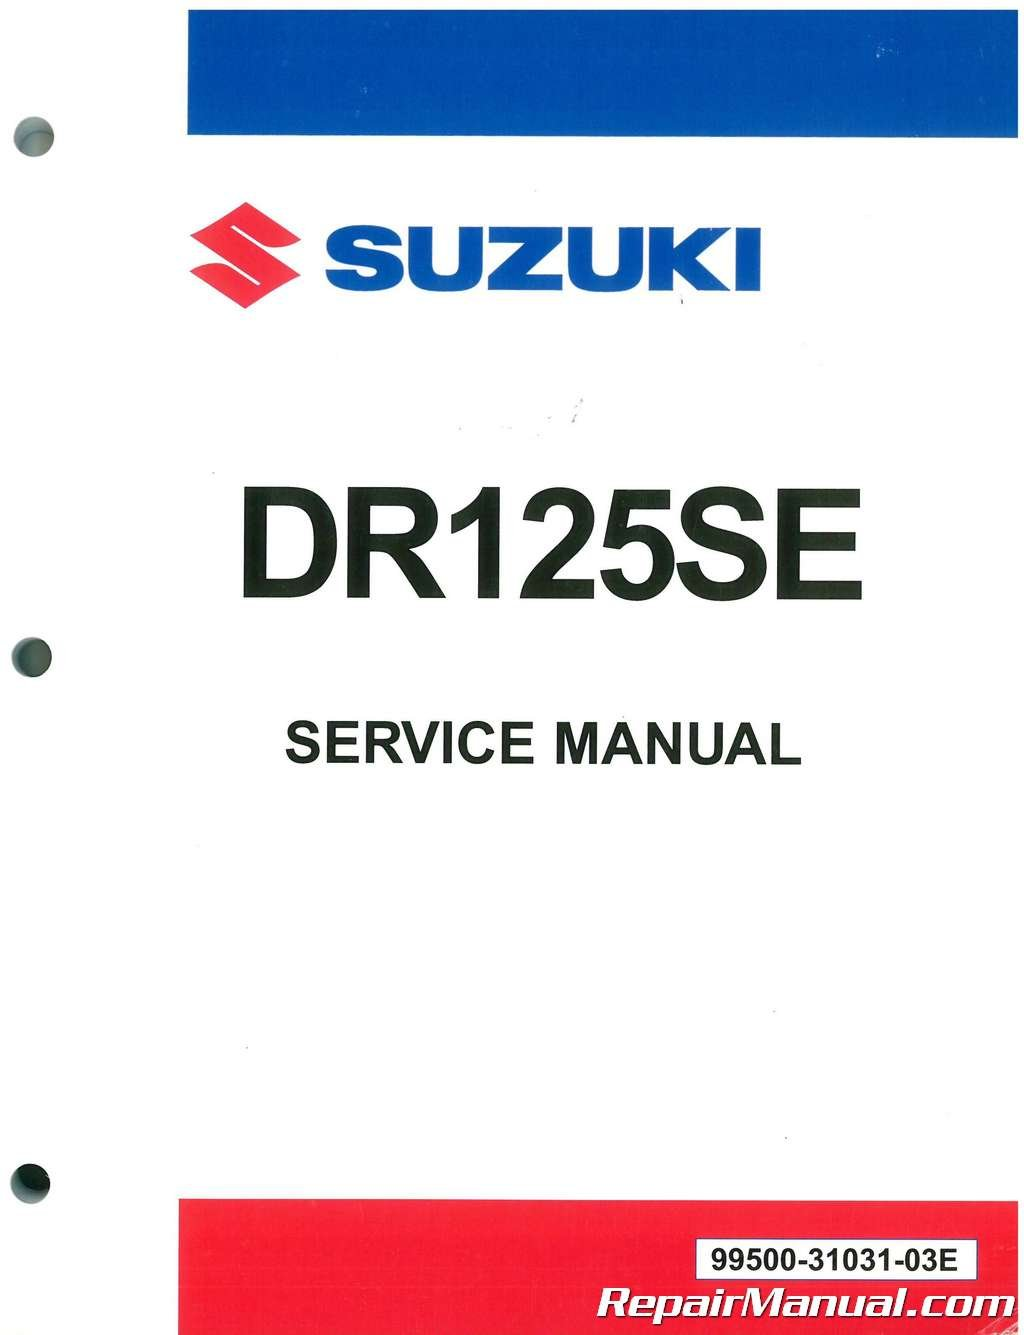 99500-31031-03E 1994-1996 Suzuki DR125SE Jebel Service Manual:  Manufacturer: Amazon.com: Books